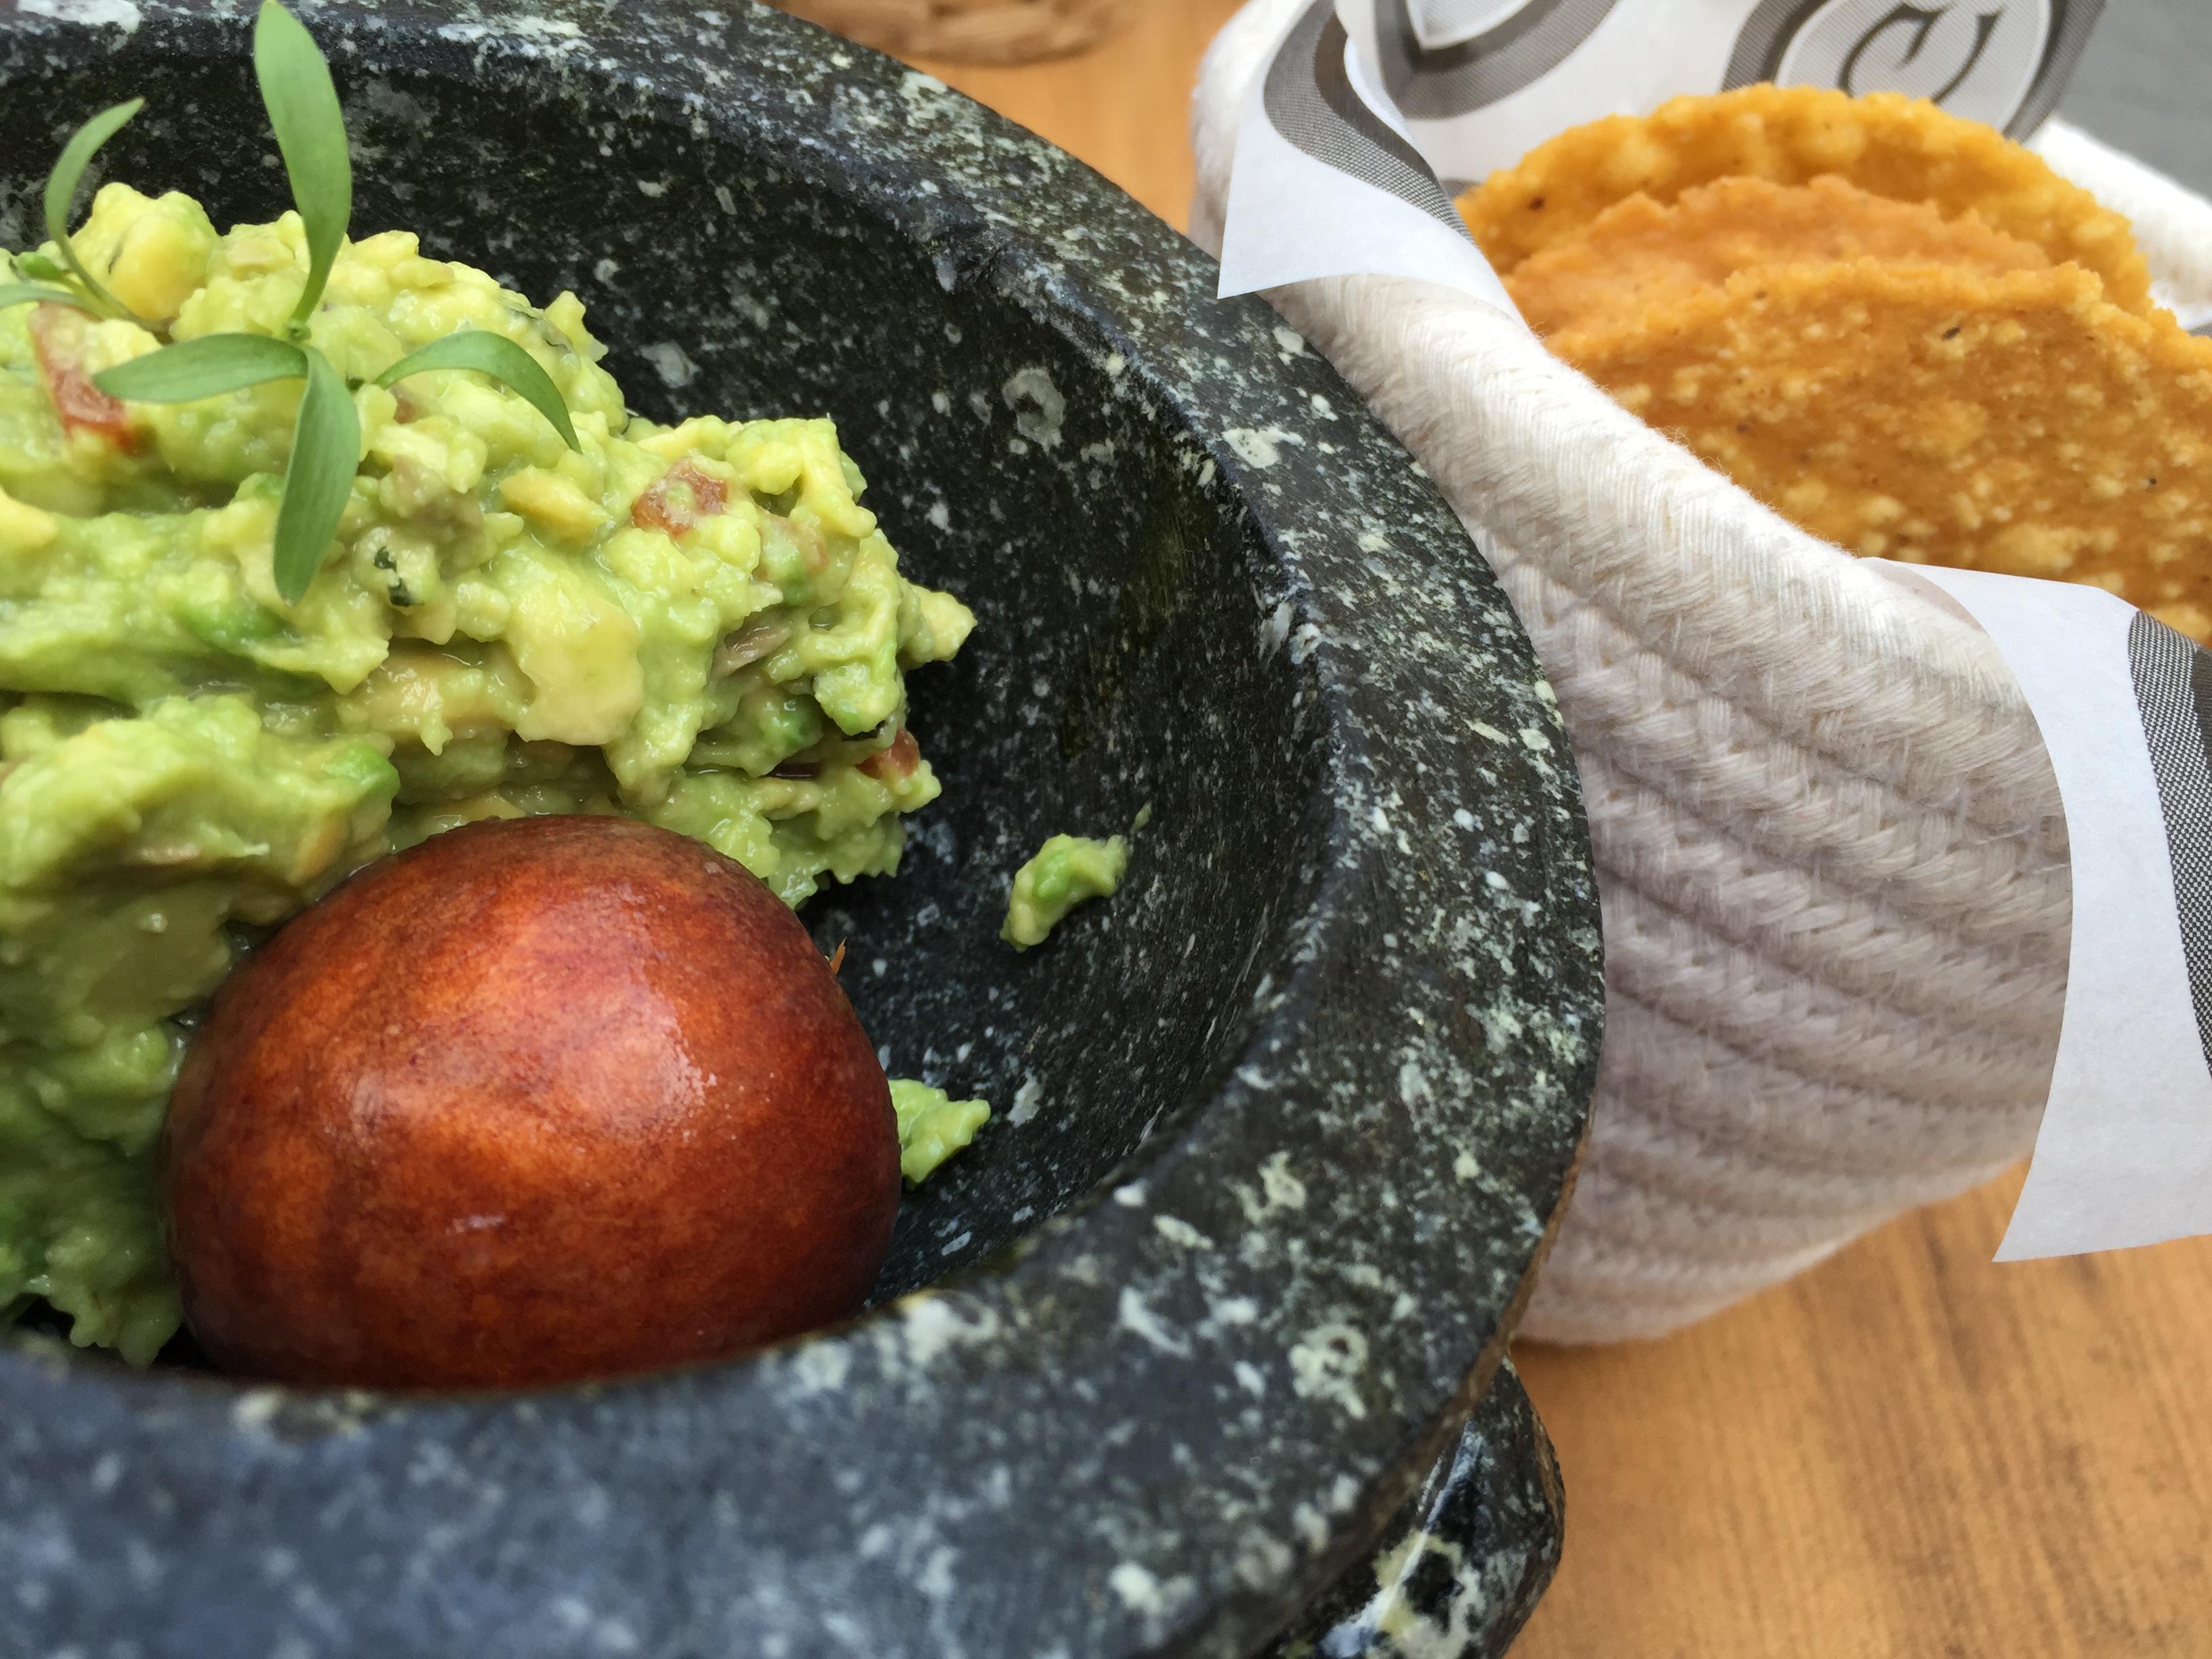 Restaurante Garabato Guacamole con totopos caseros